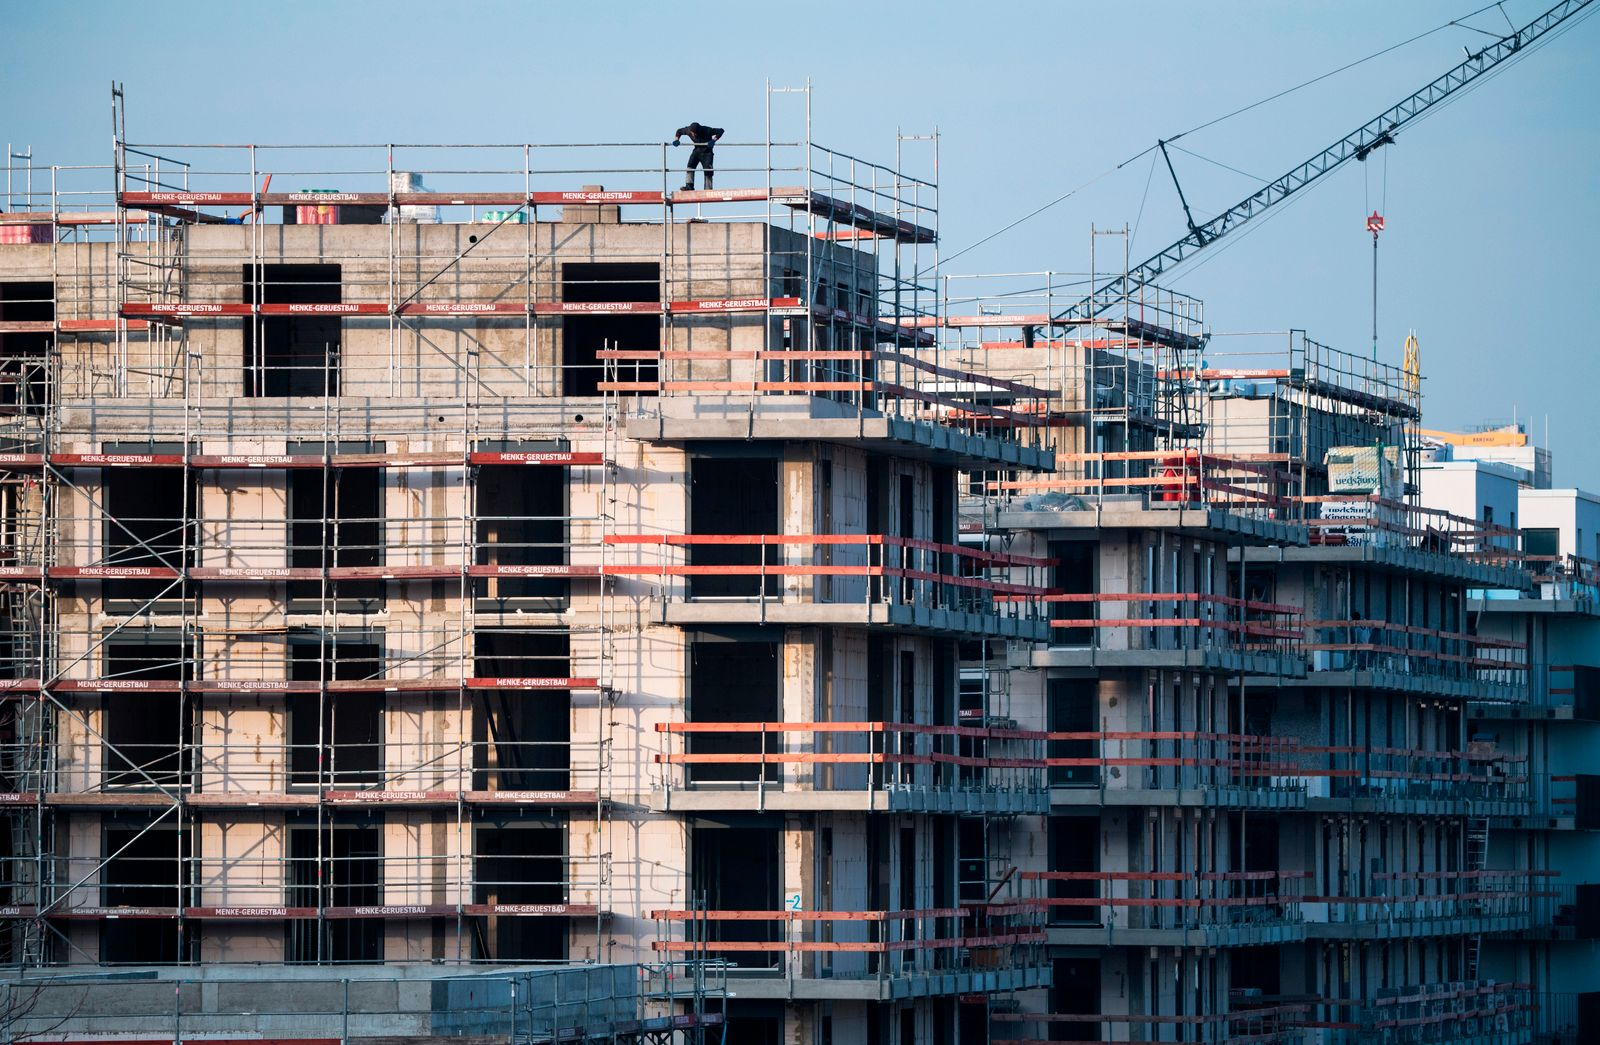 Wohnungsbau / Bauindustrie / Baustelle / Bau